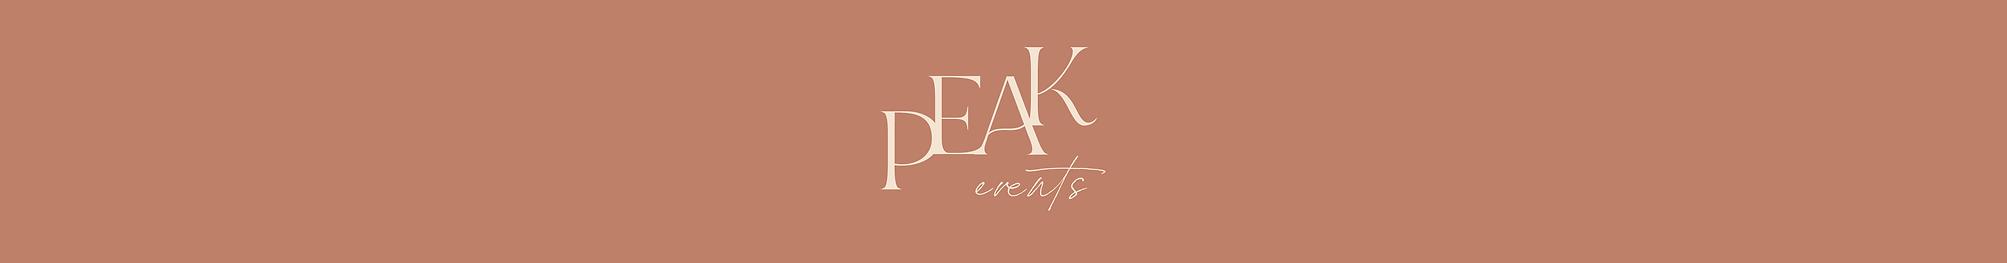 Peak Events-01.png